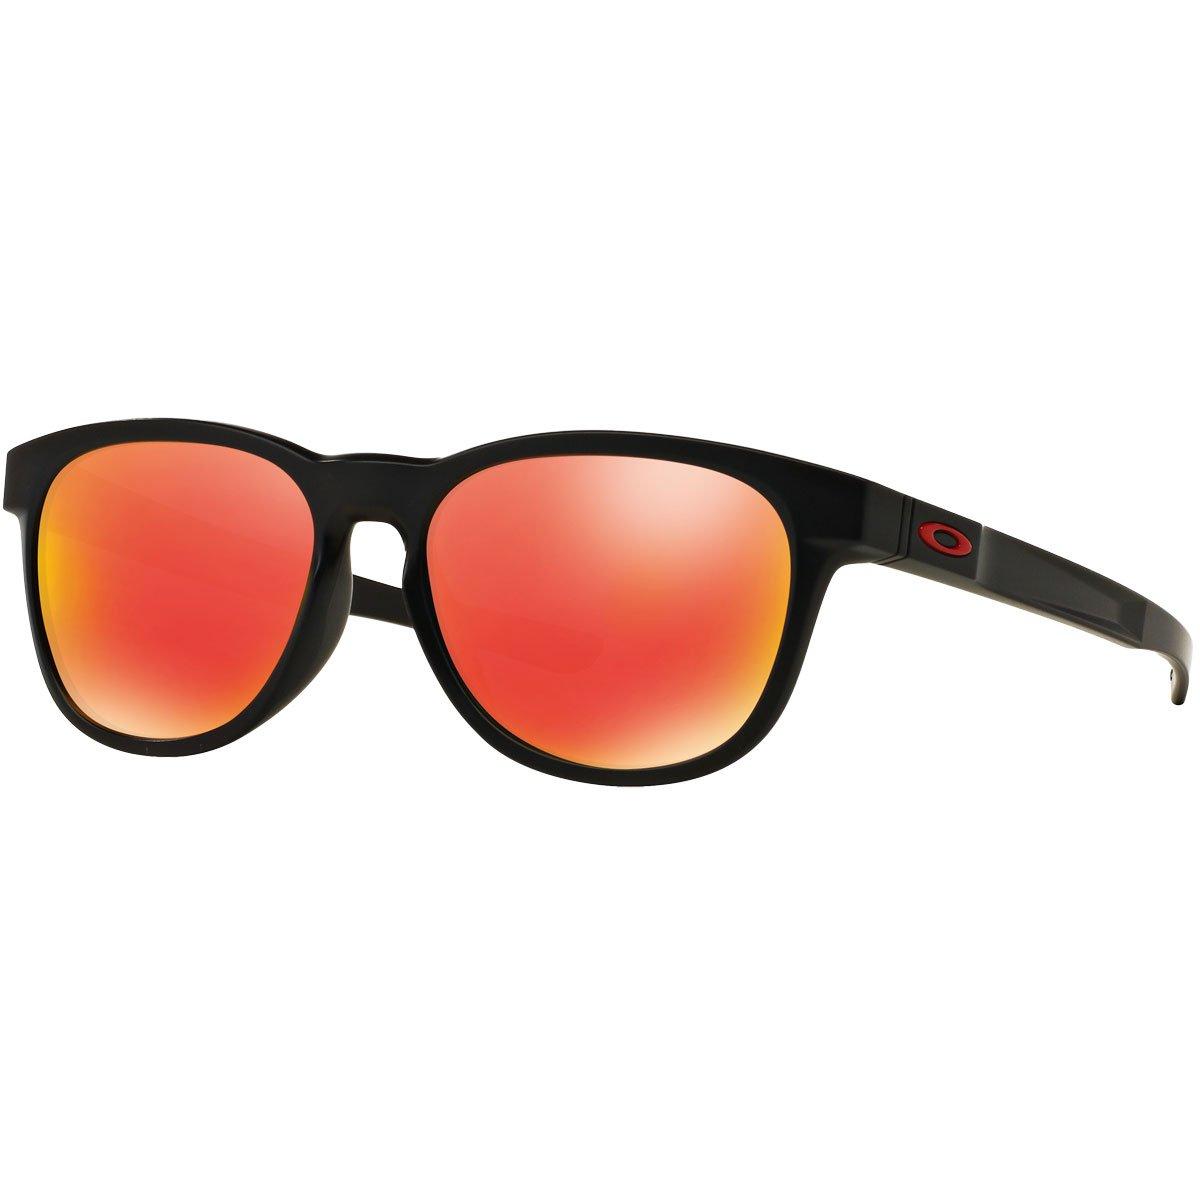 Oakley Men's Stringer Non-Polarized Iridium Rectangular Sunglasses, Matte black, 55.02 mm